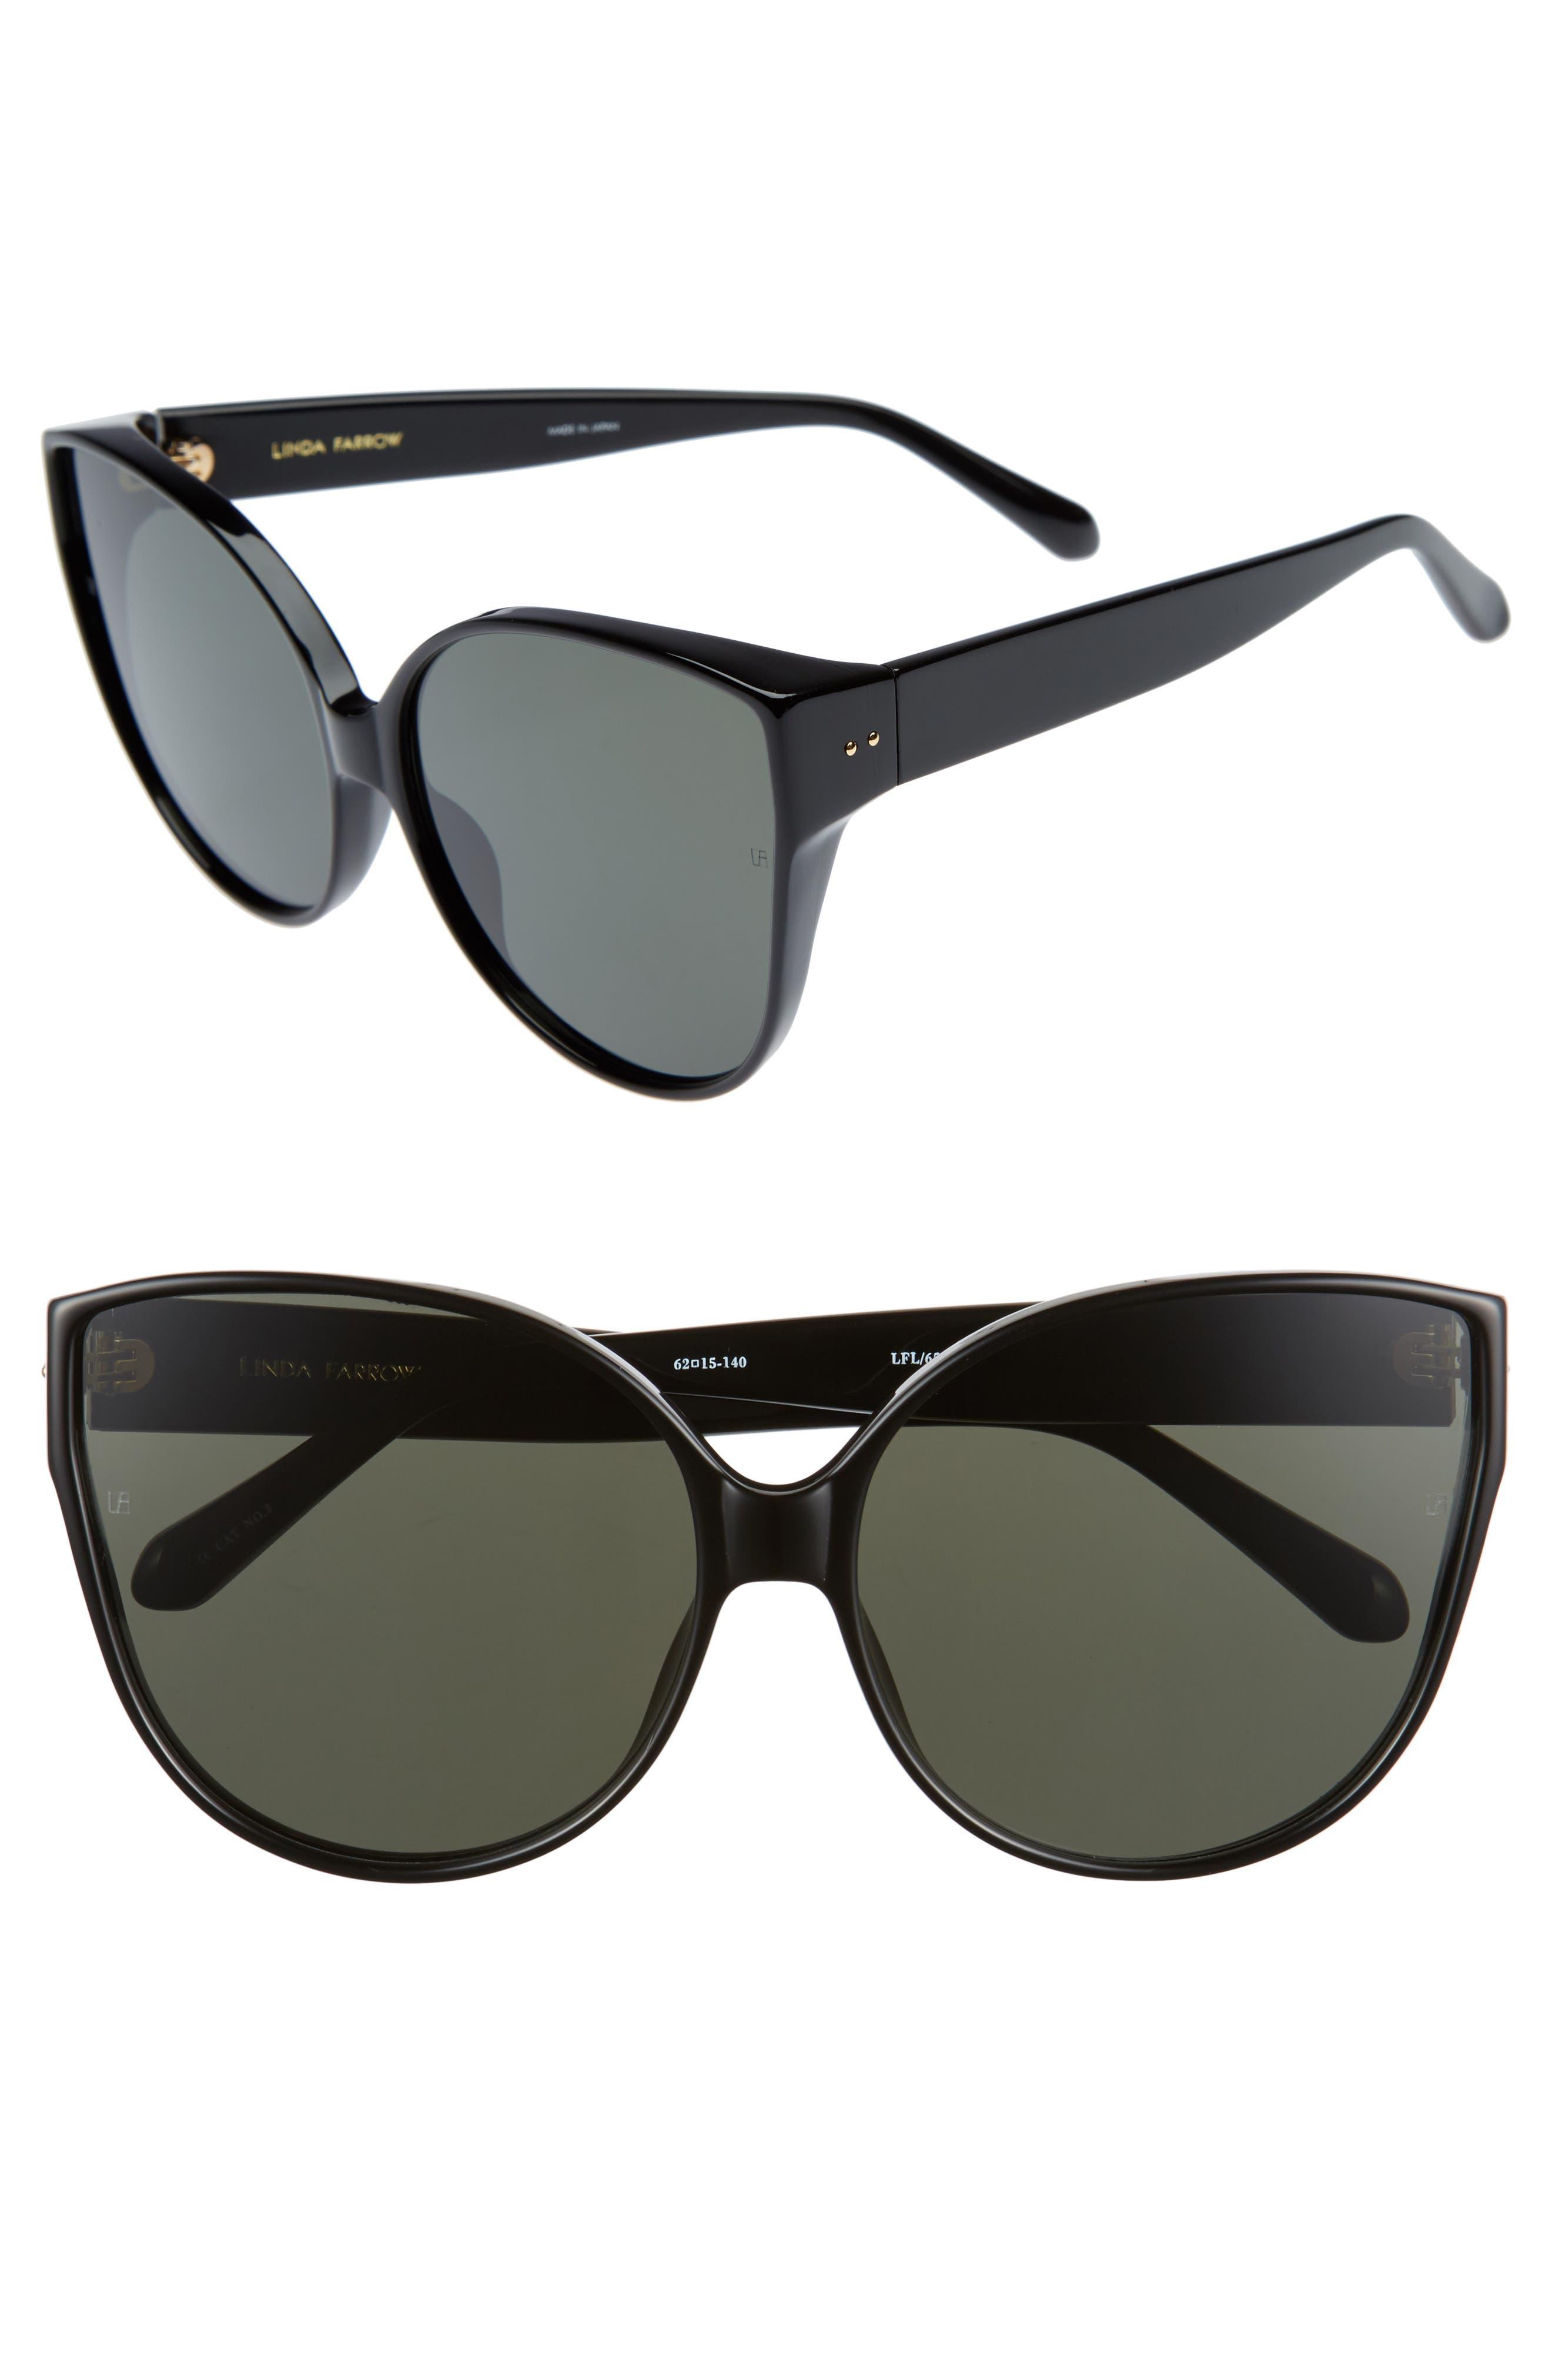 Main Image - Linda Farrow 62mm Oversize Cat Eye Sunglasses